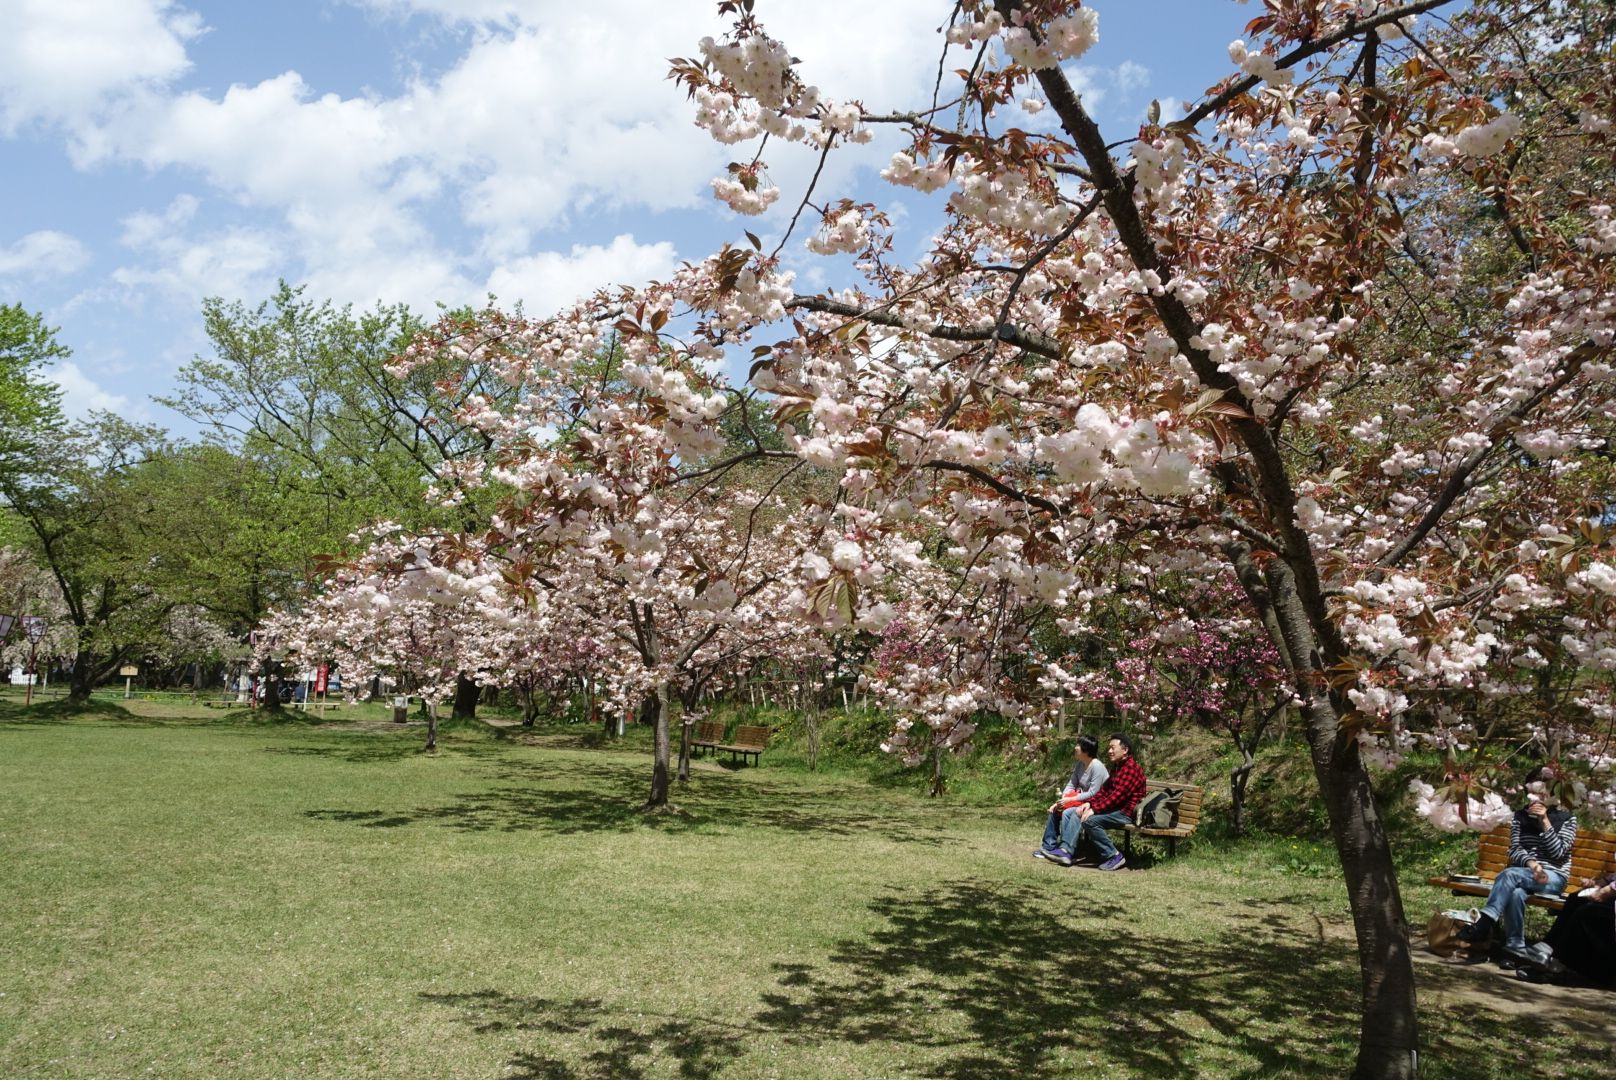 2017年5月7日付 弘前公園さくら情報(第25回)【弘前公園・弘前城】